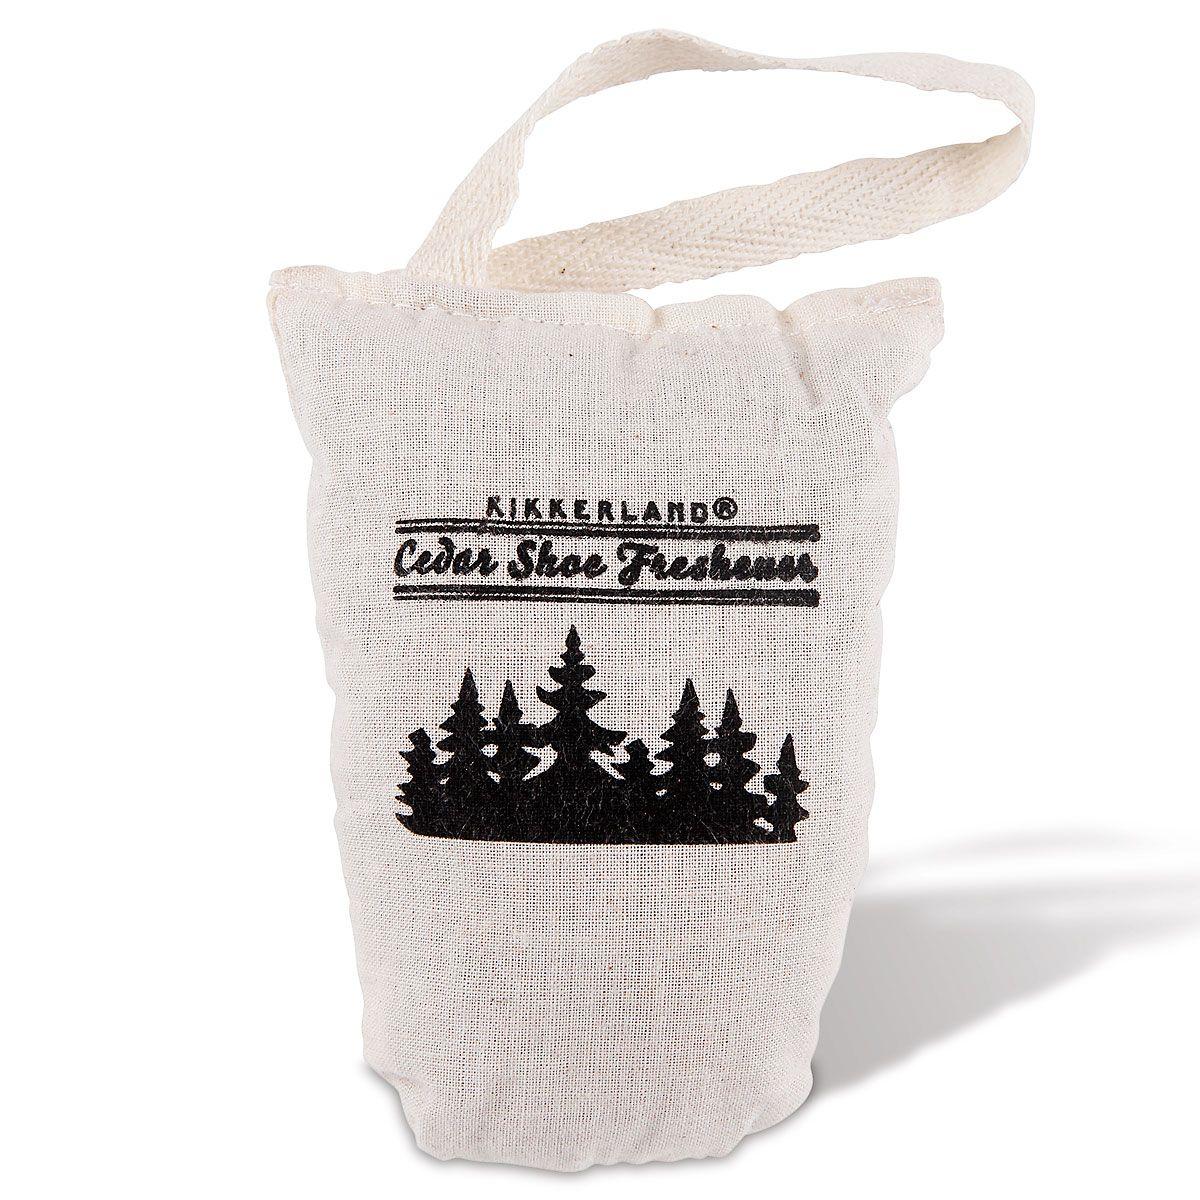 Cedar Shoe Fresheners